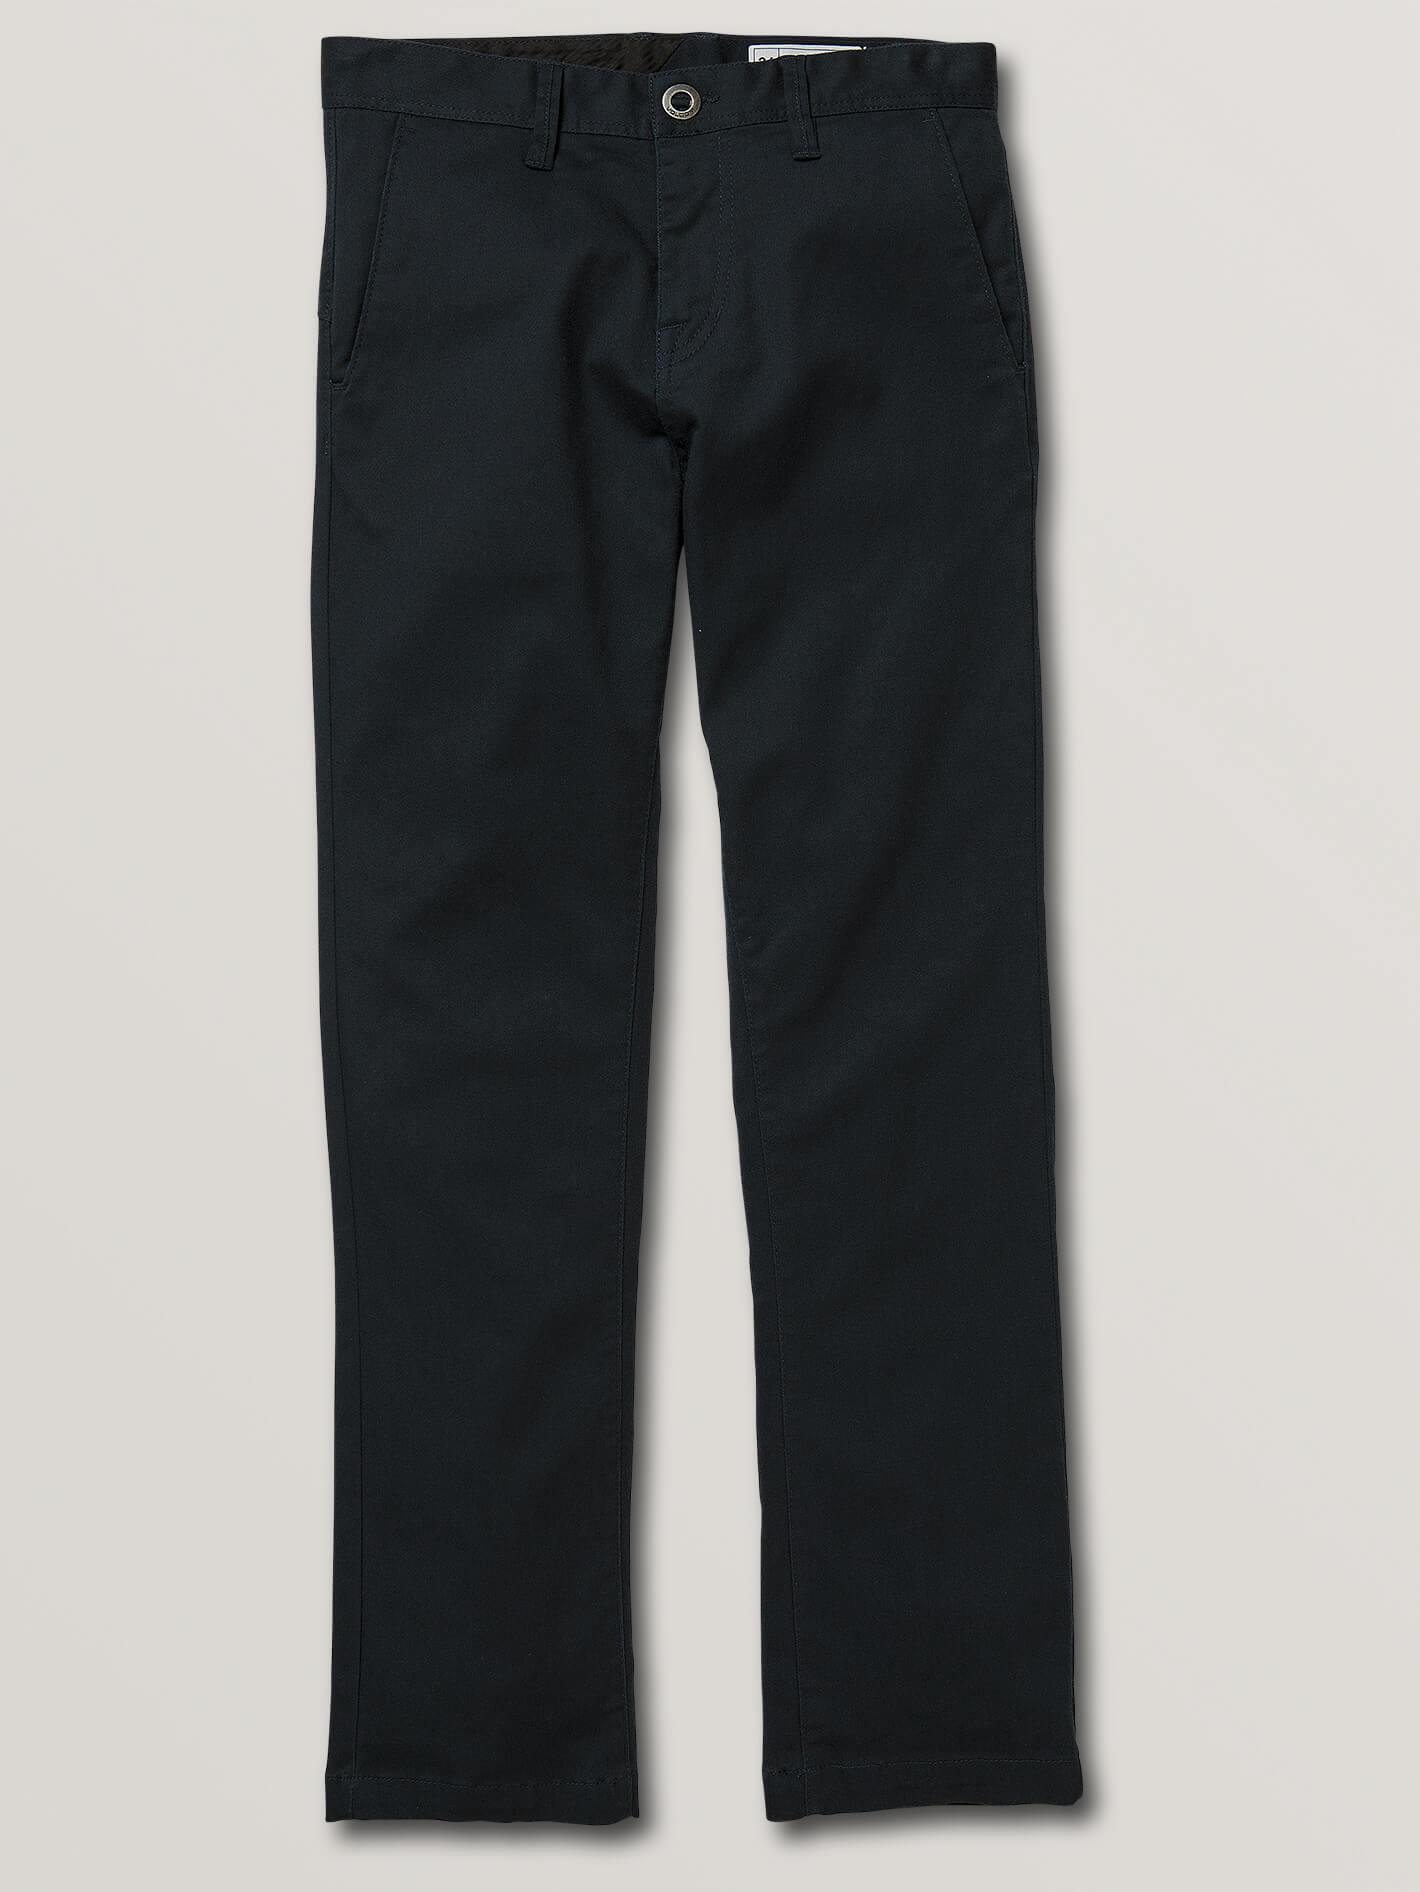 Big Boys Frickin Modern Stretch Chino Pants - Dark Navy - DARK NAVY / 27